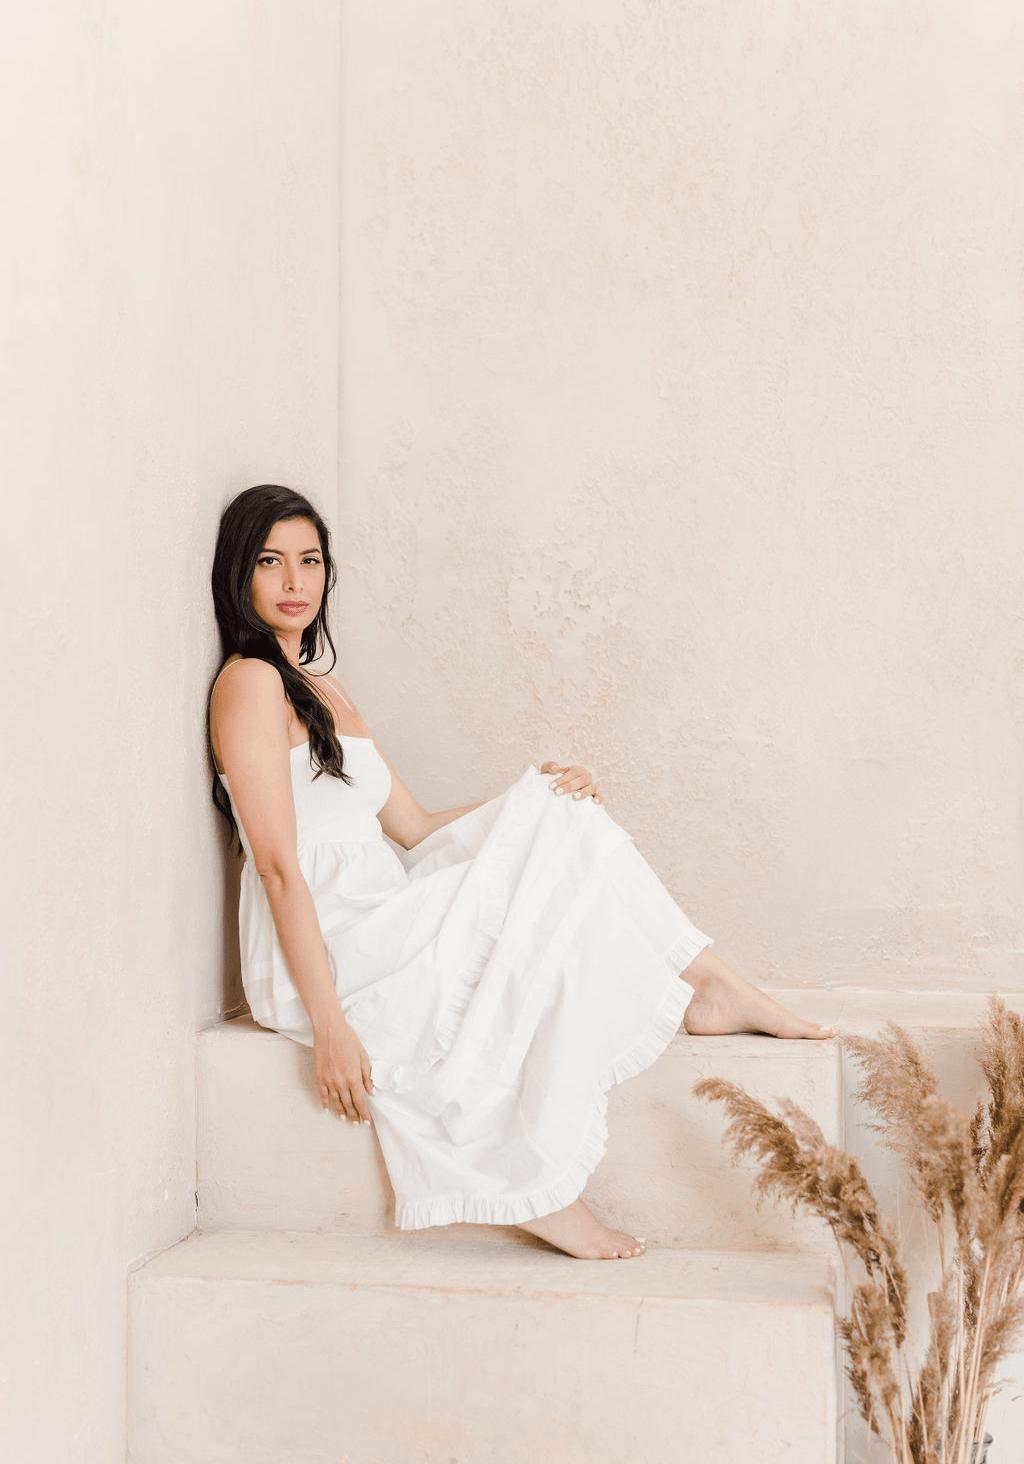 Sheba Zaidi, Mahara Mindfulness, Co-founder